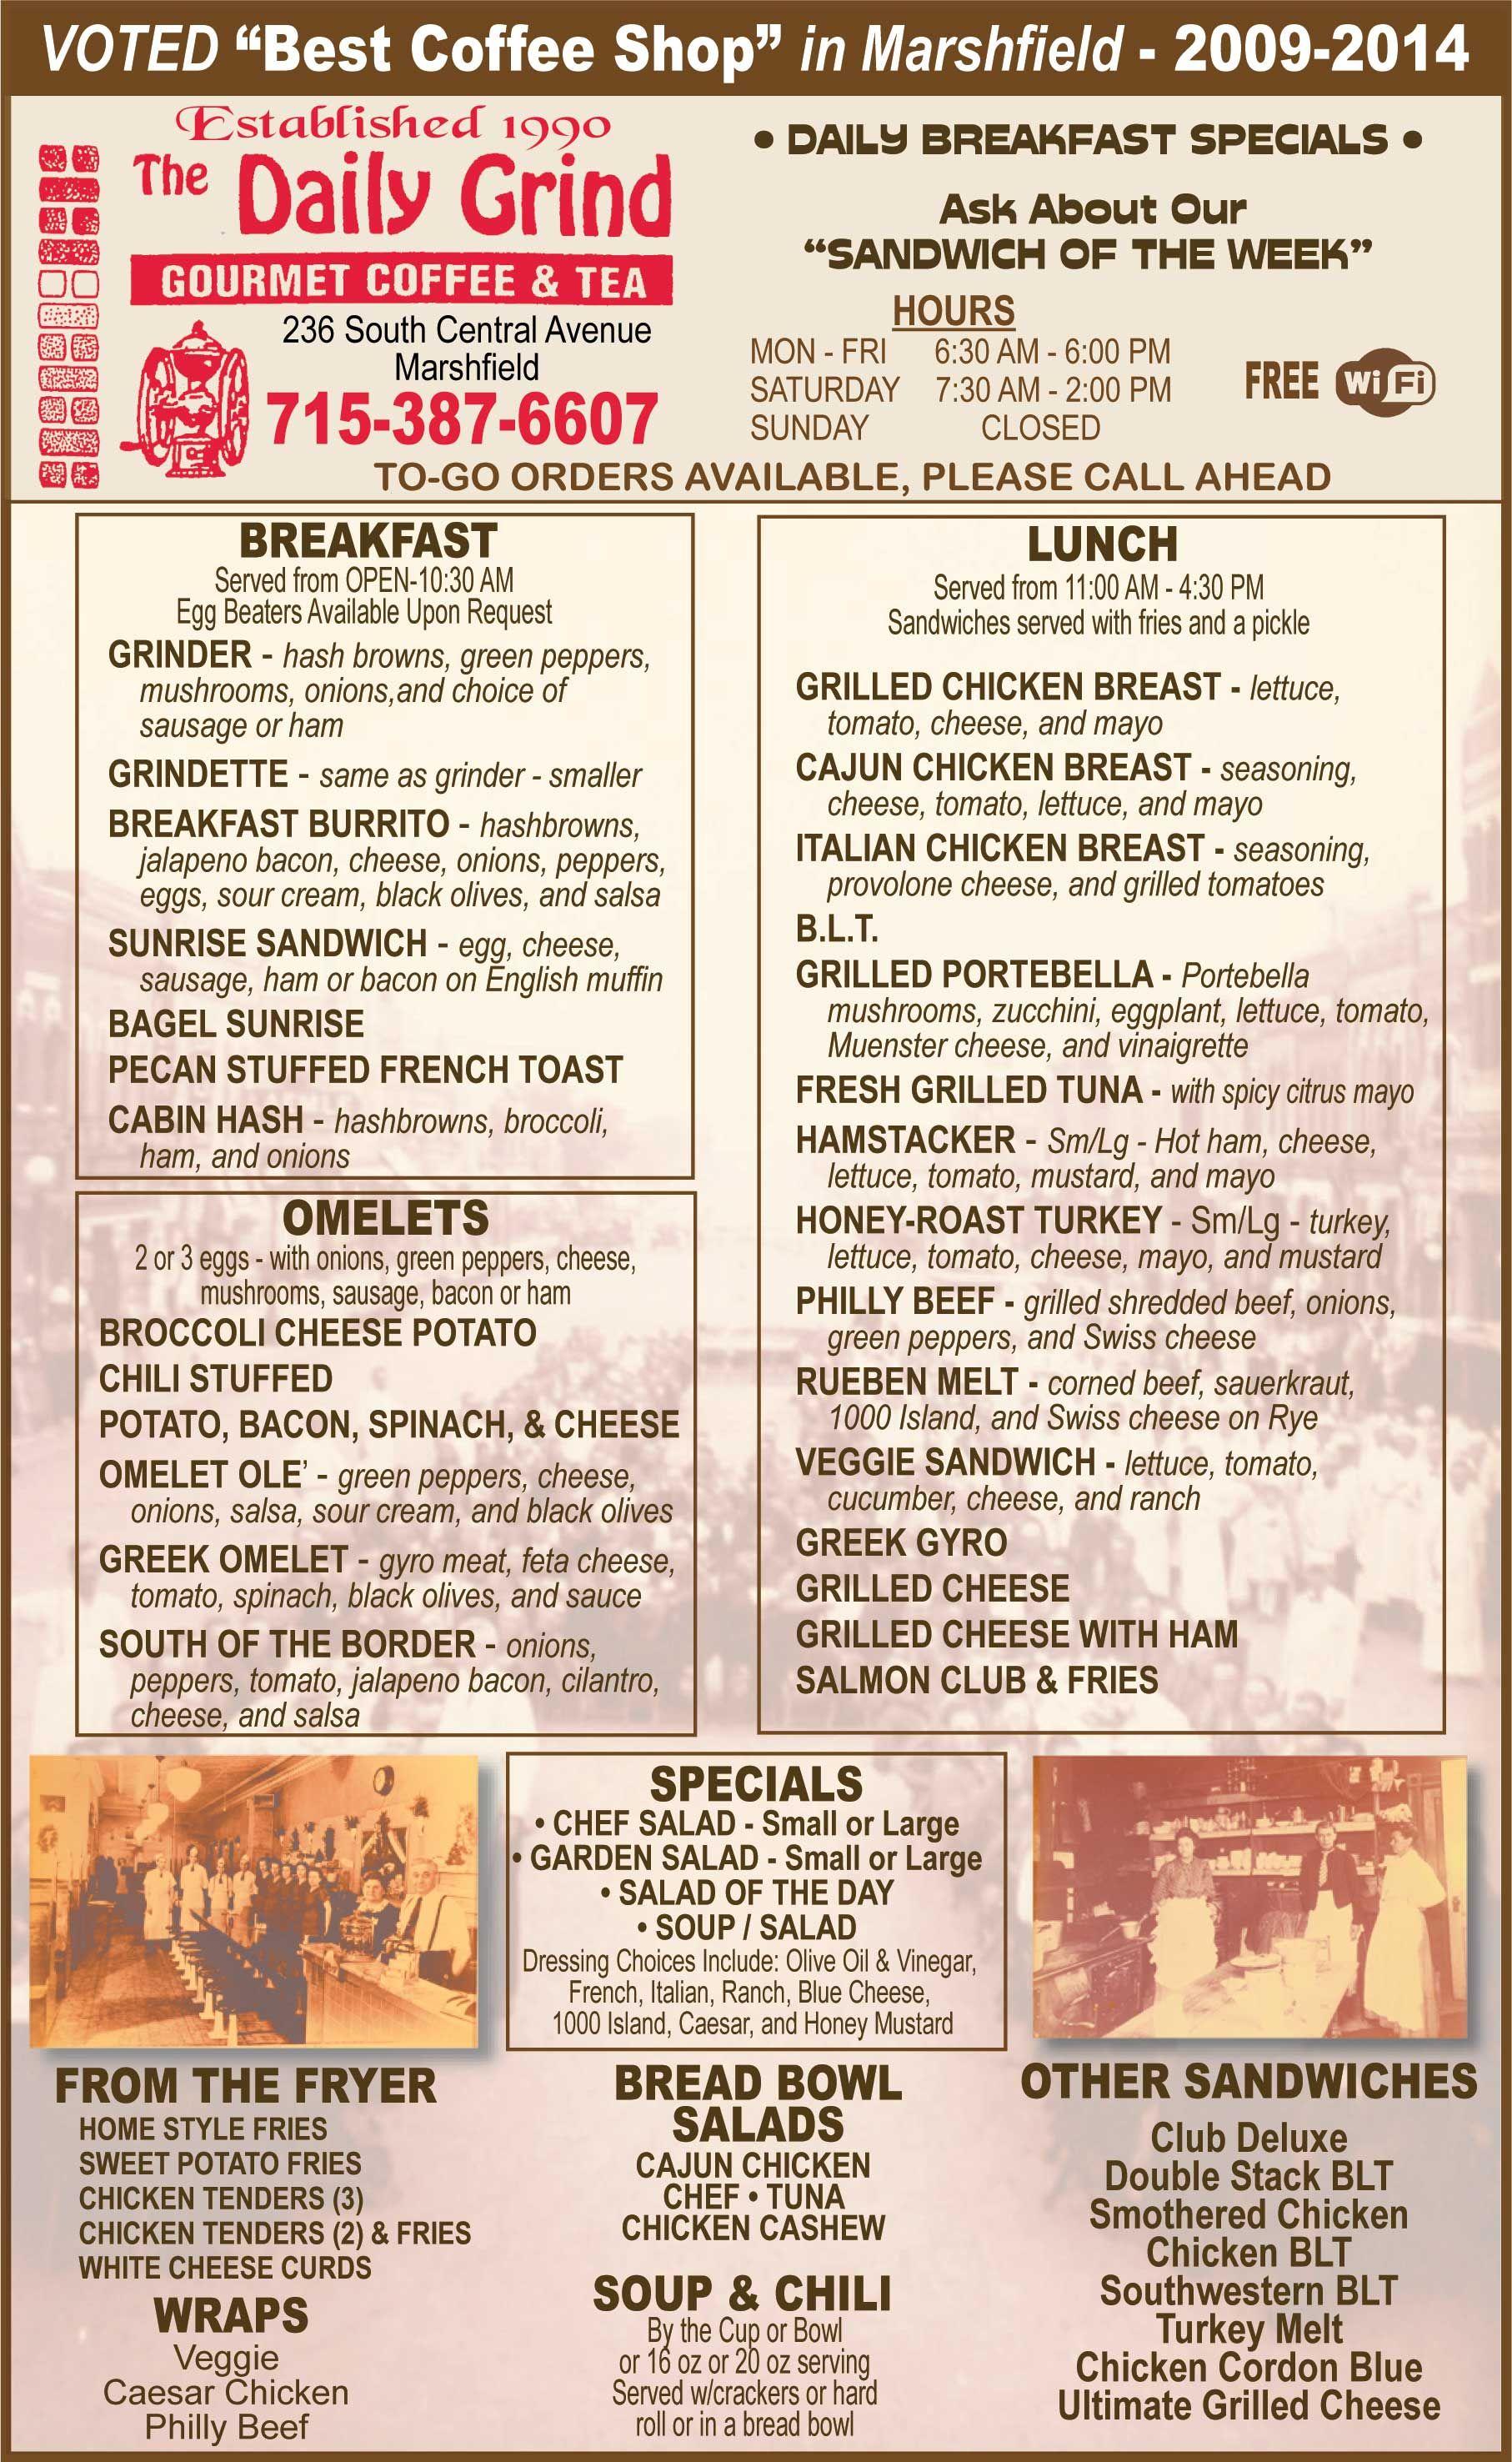 The Daily Grind Restaurant Menu Marshfield Wi 2015 16 Restaurants